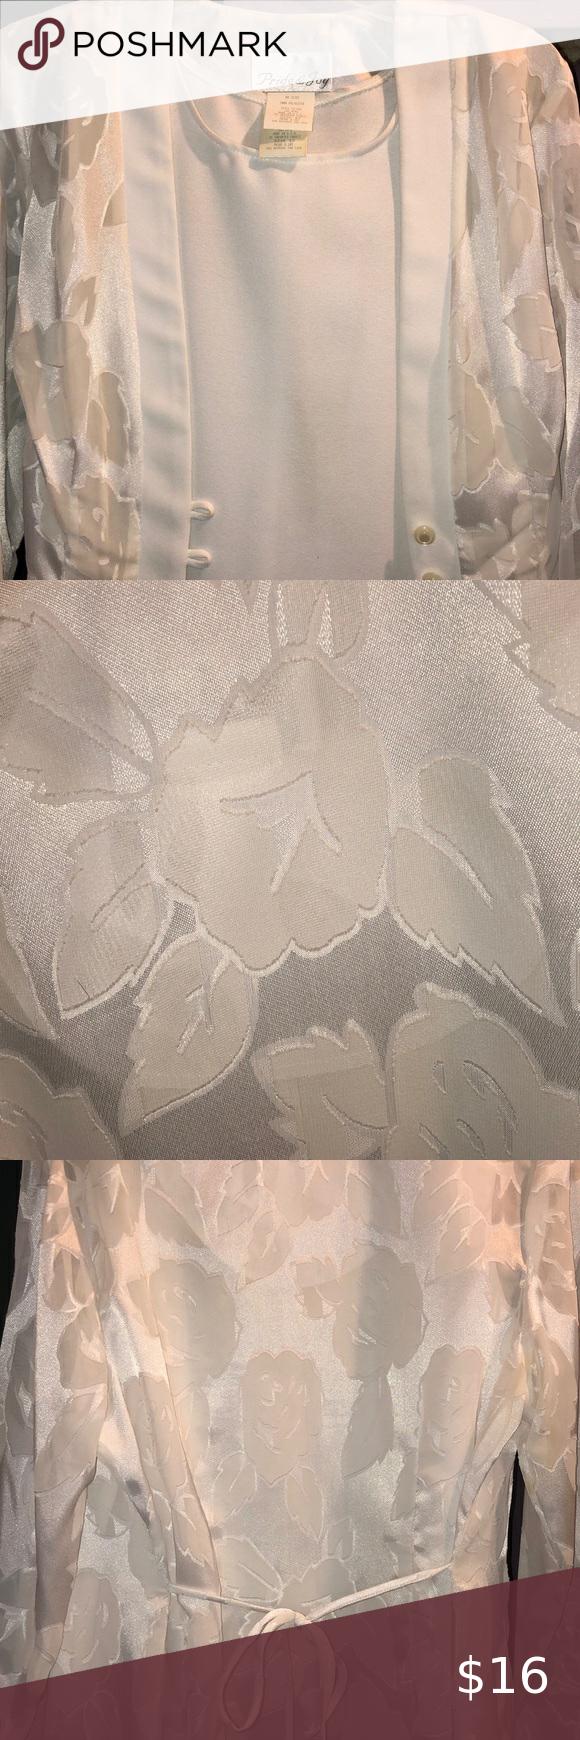 Pride Joy Set 5 30 In Bundle 3 Joy Dress Set Dress Piece Dress [ 1740 x 580 Pixel ]